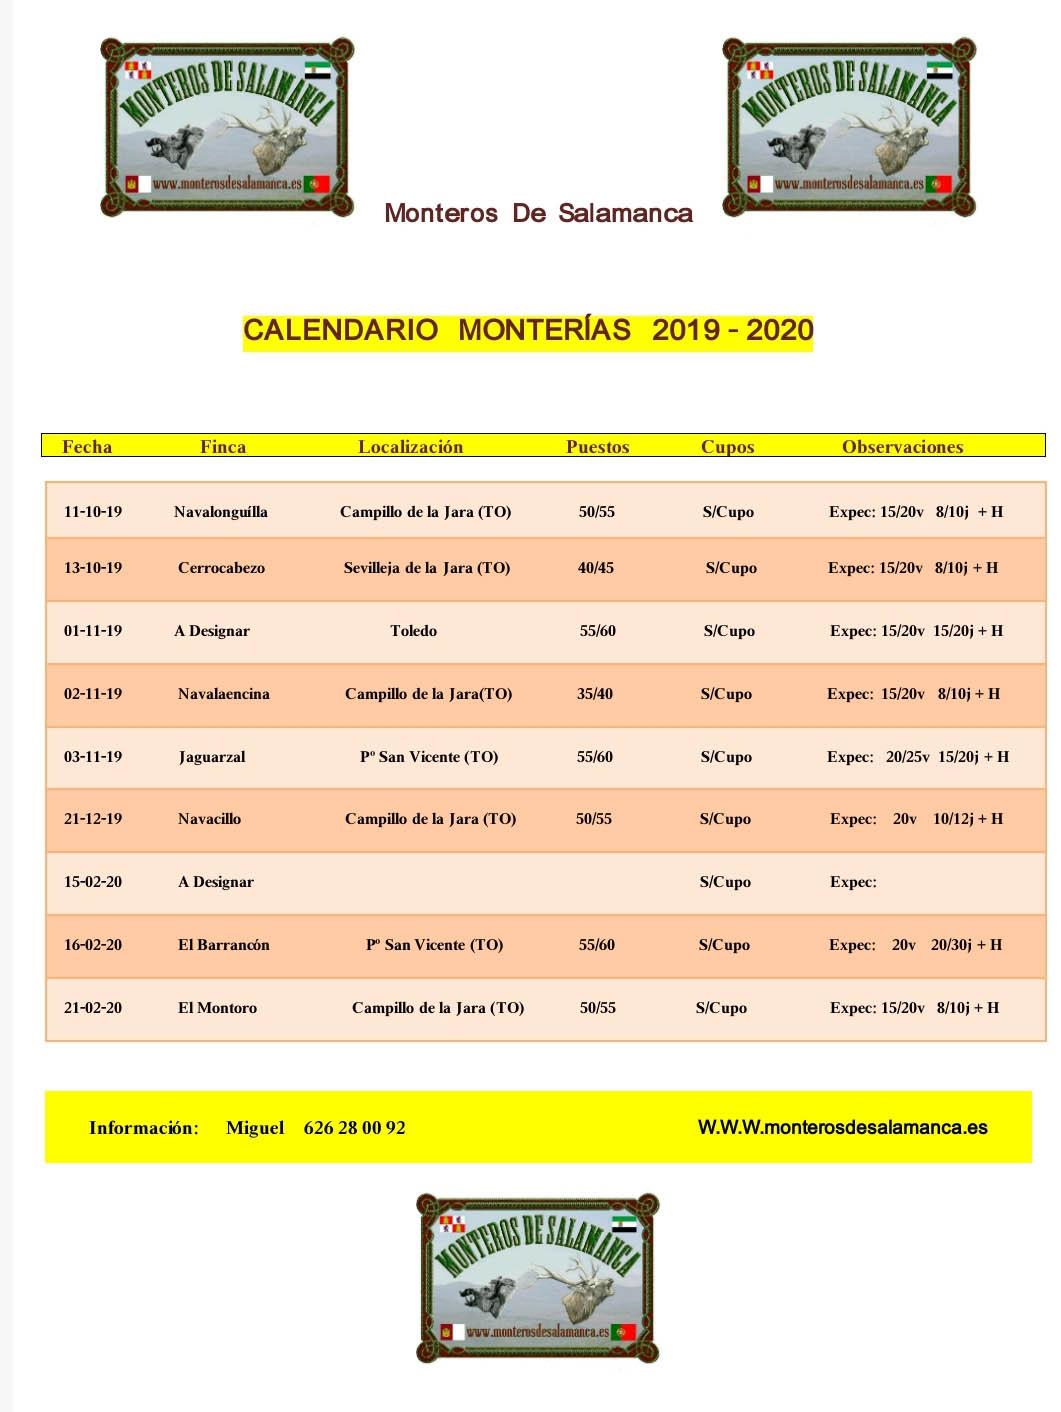 Programa Monterias Monteros de Salamanca